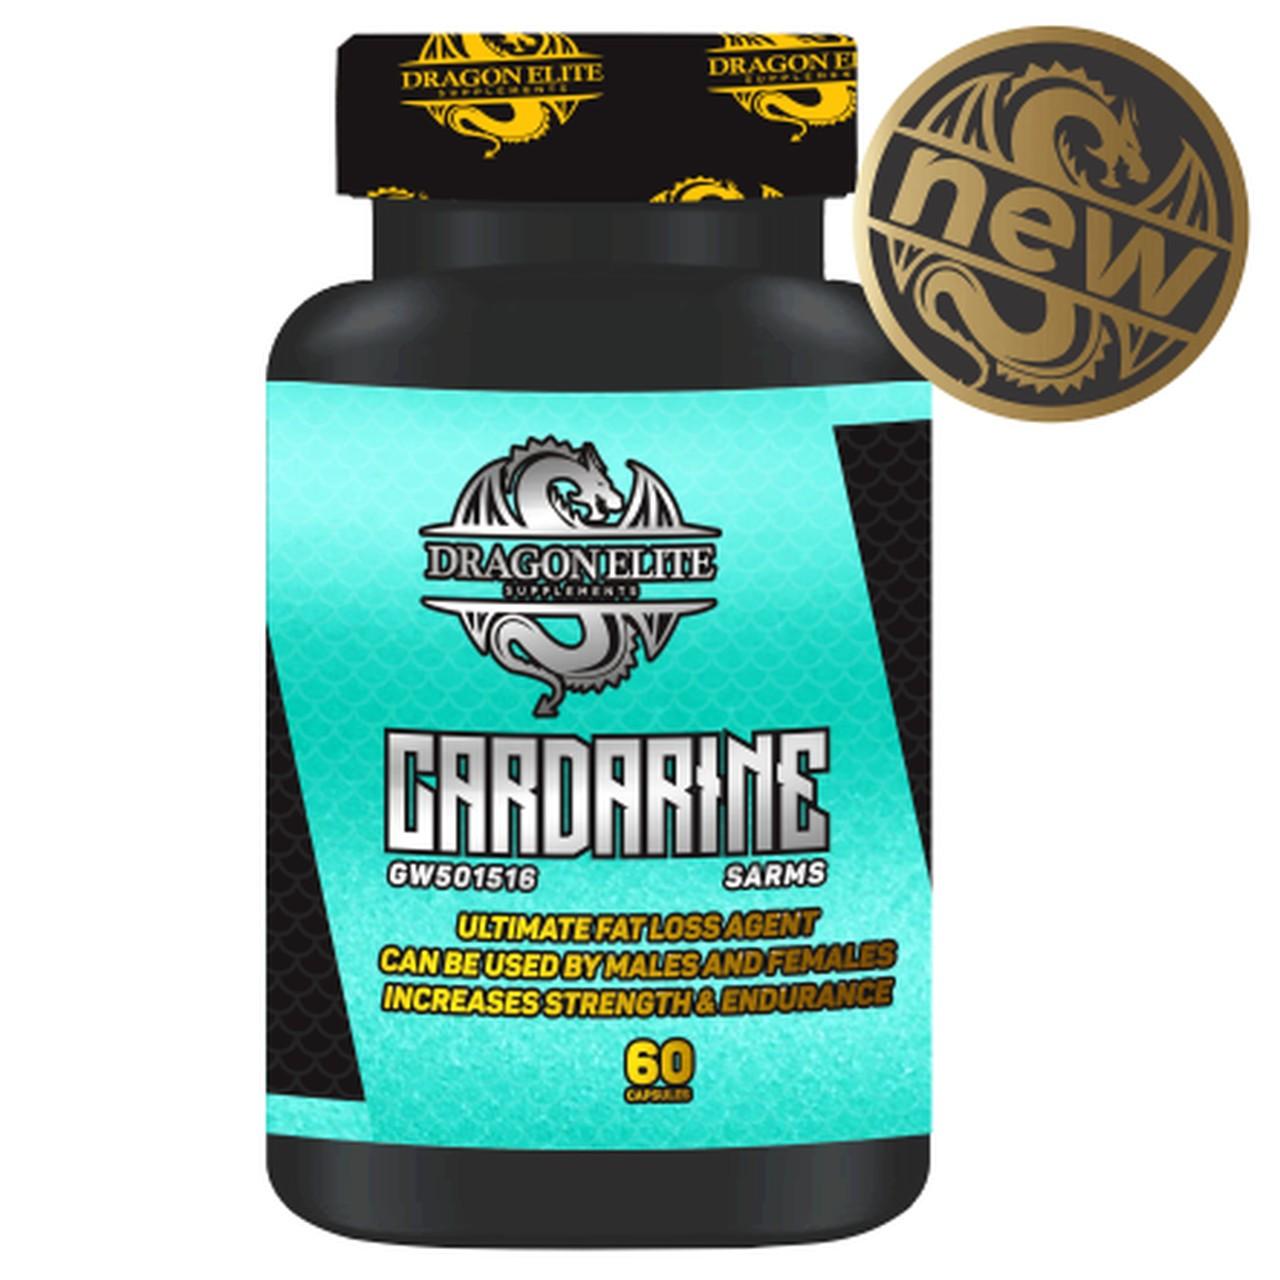 Carderine GW501516 SARMS 15mg (60 Caps) - Dragon Elite